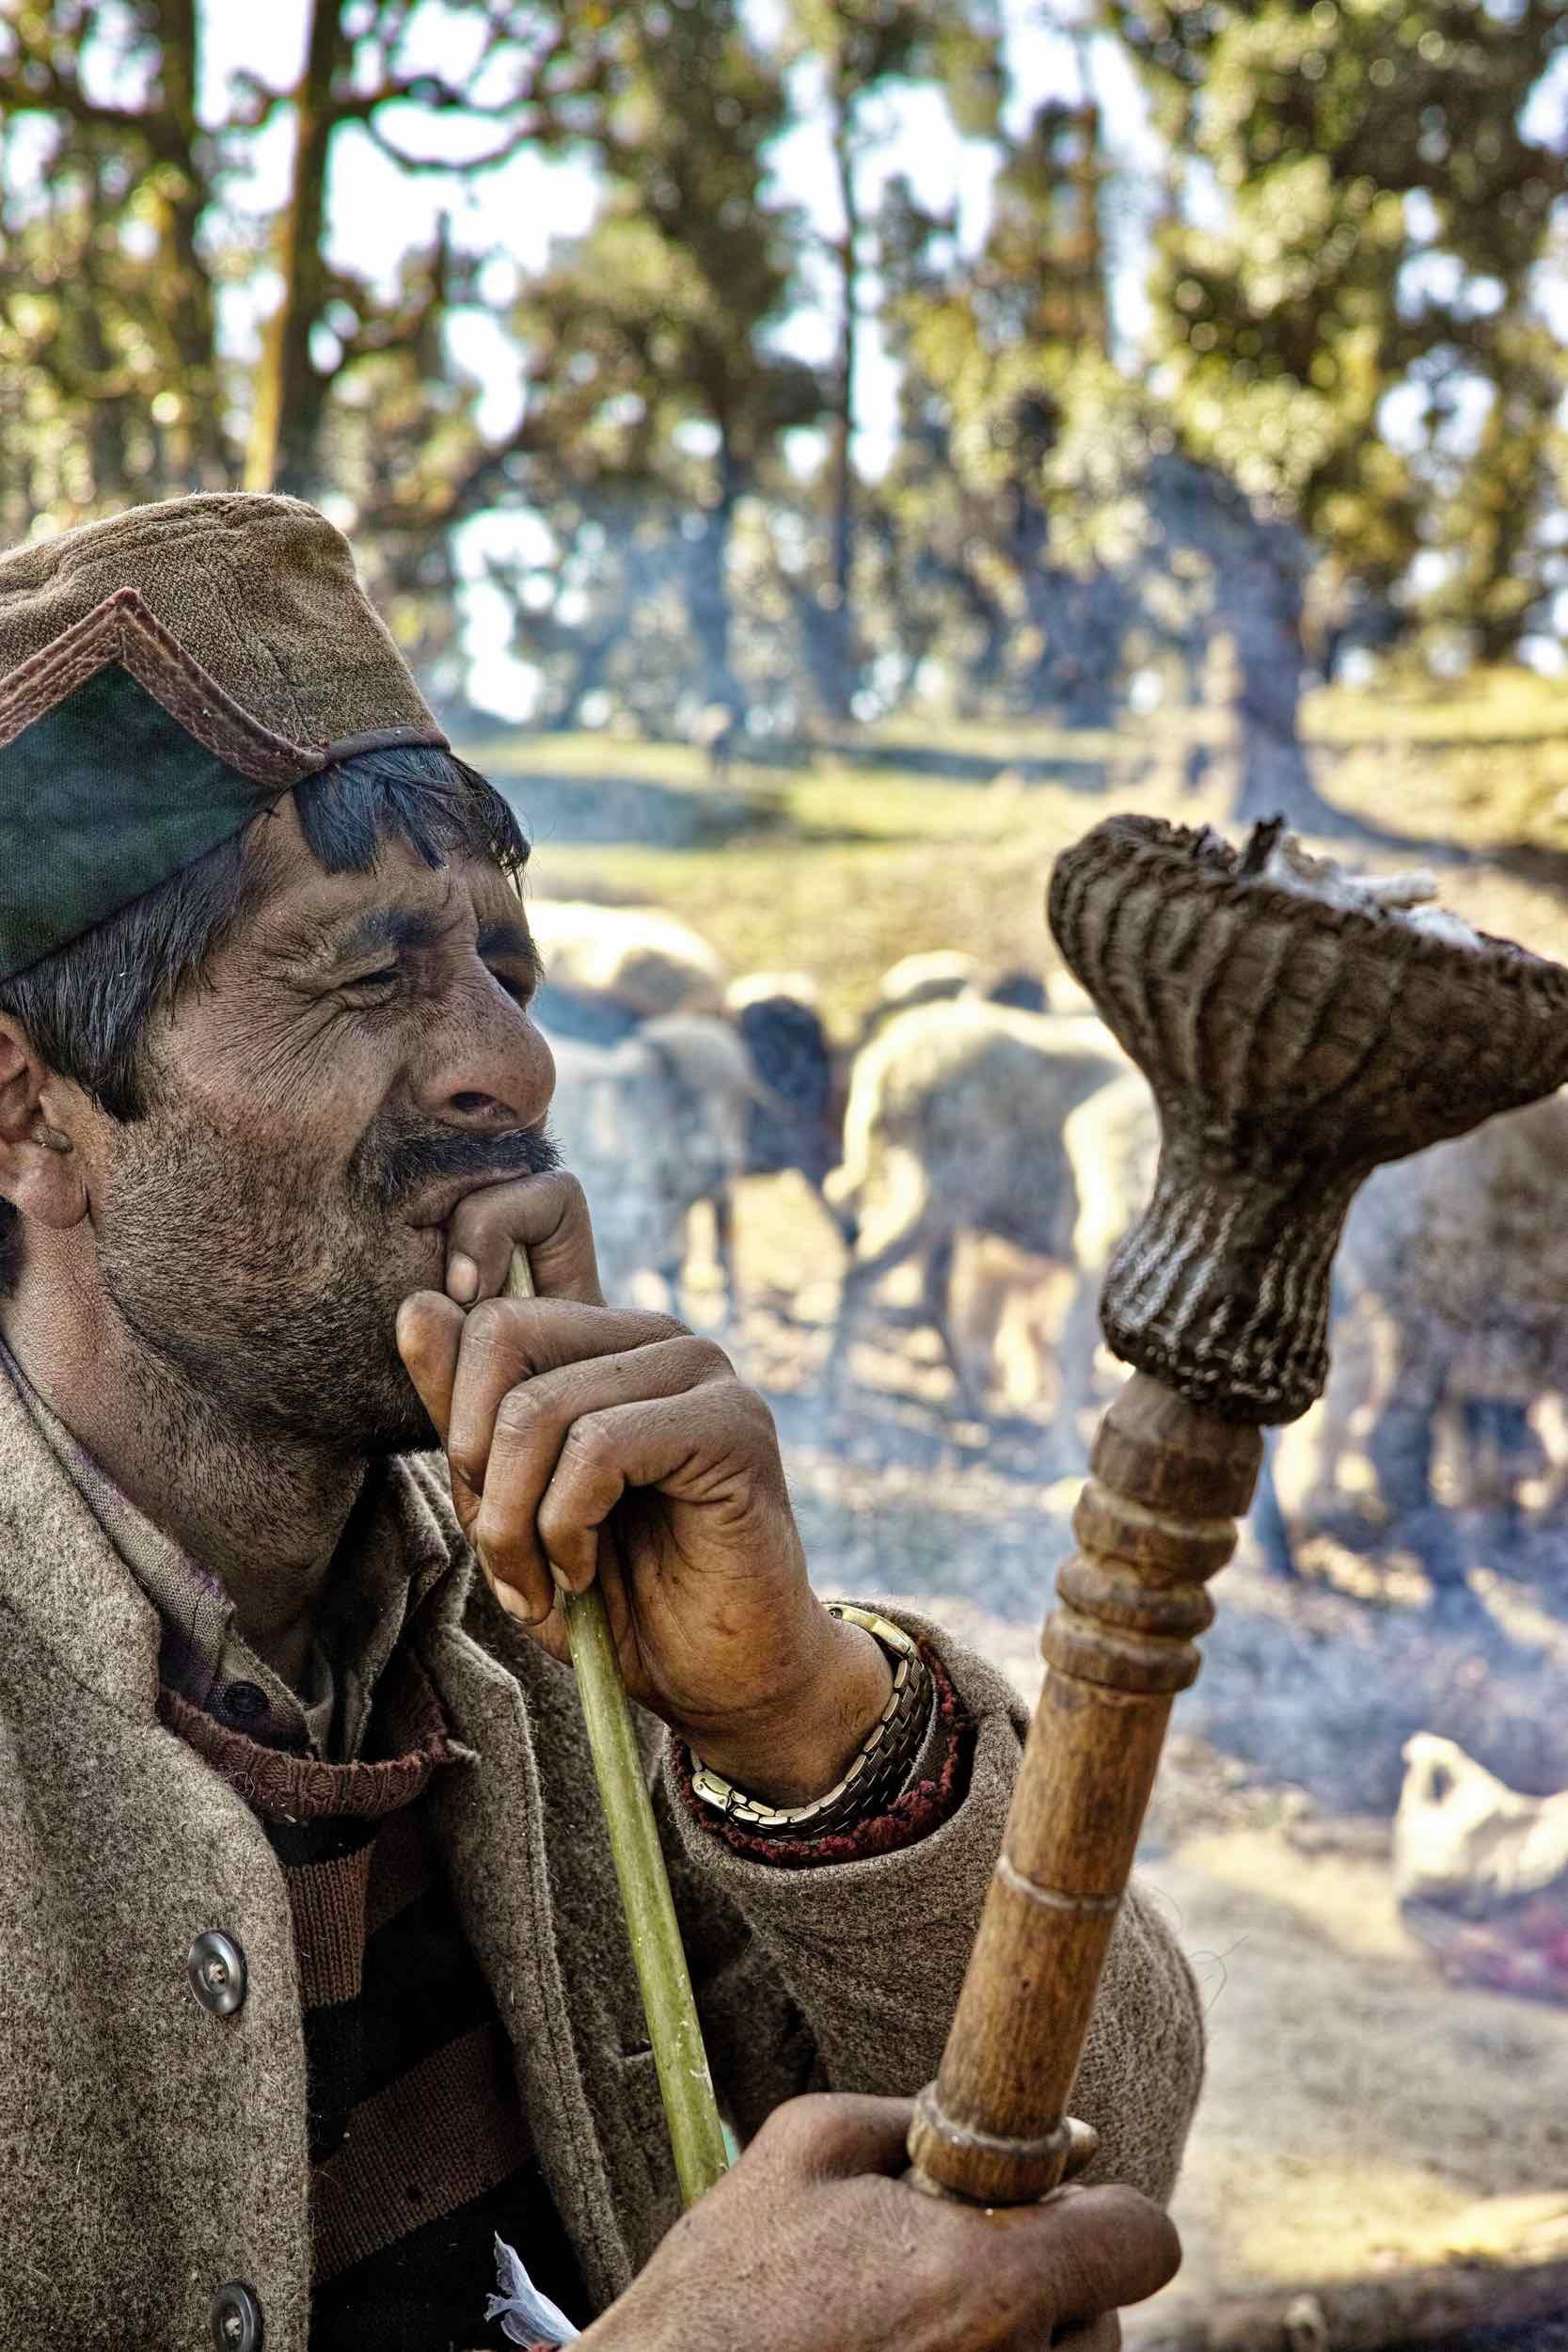 A Gaddi smoking a Hookah at Nag Tibba